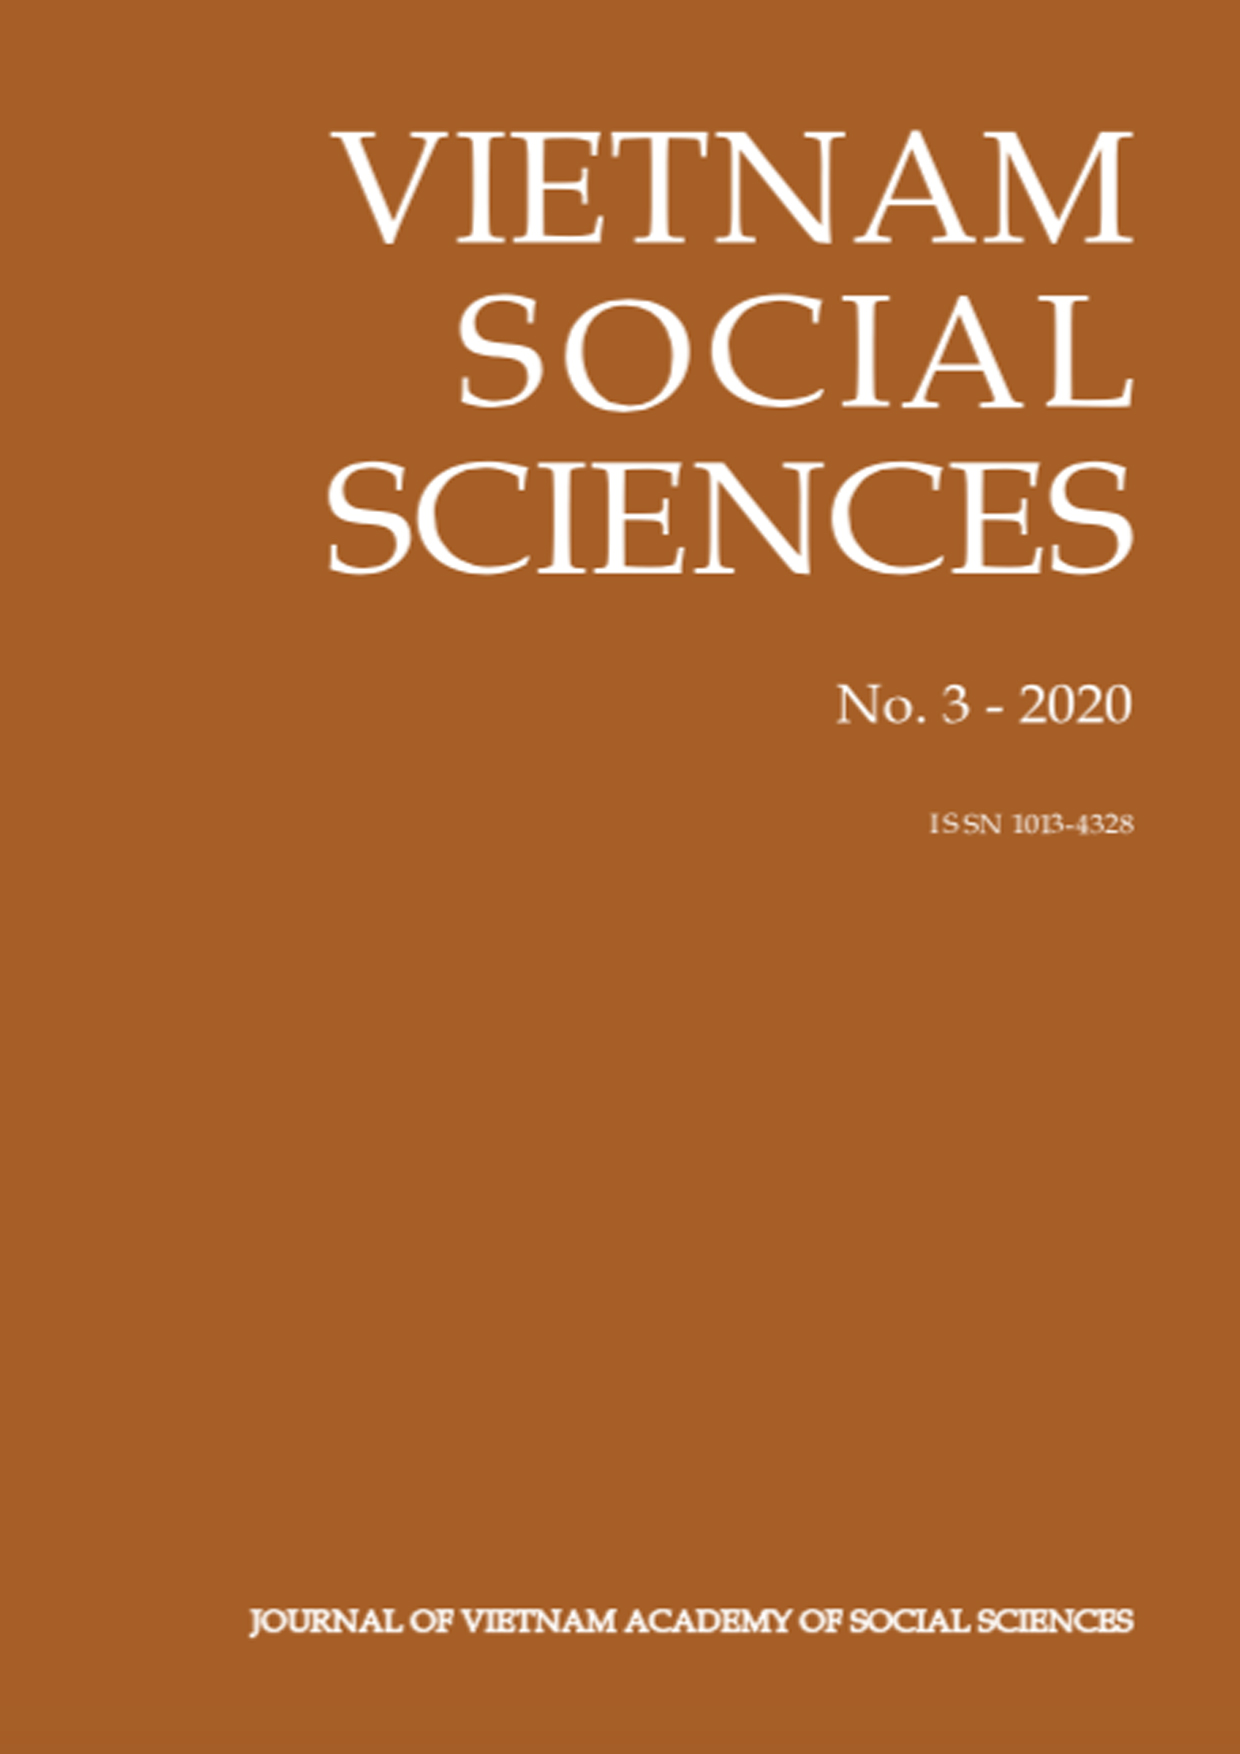 Vietnam Social Sciences. No. 3 - 2020